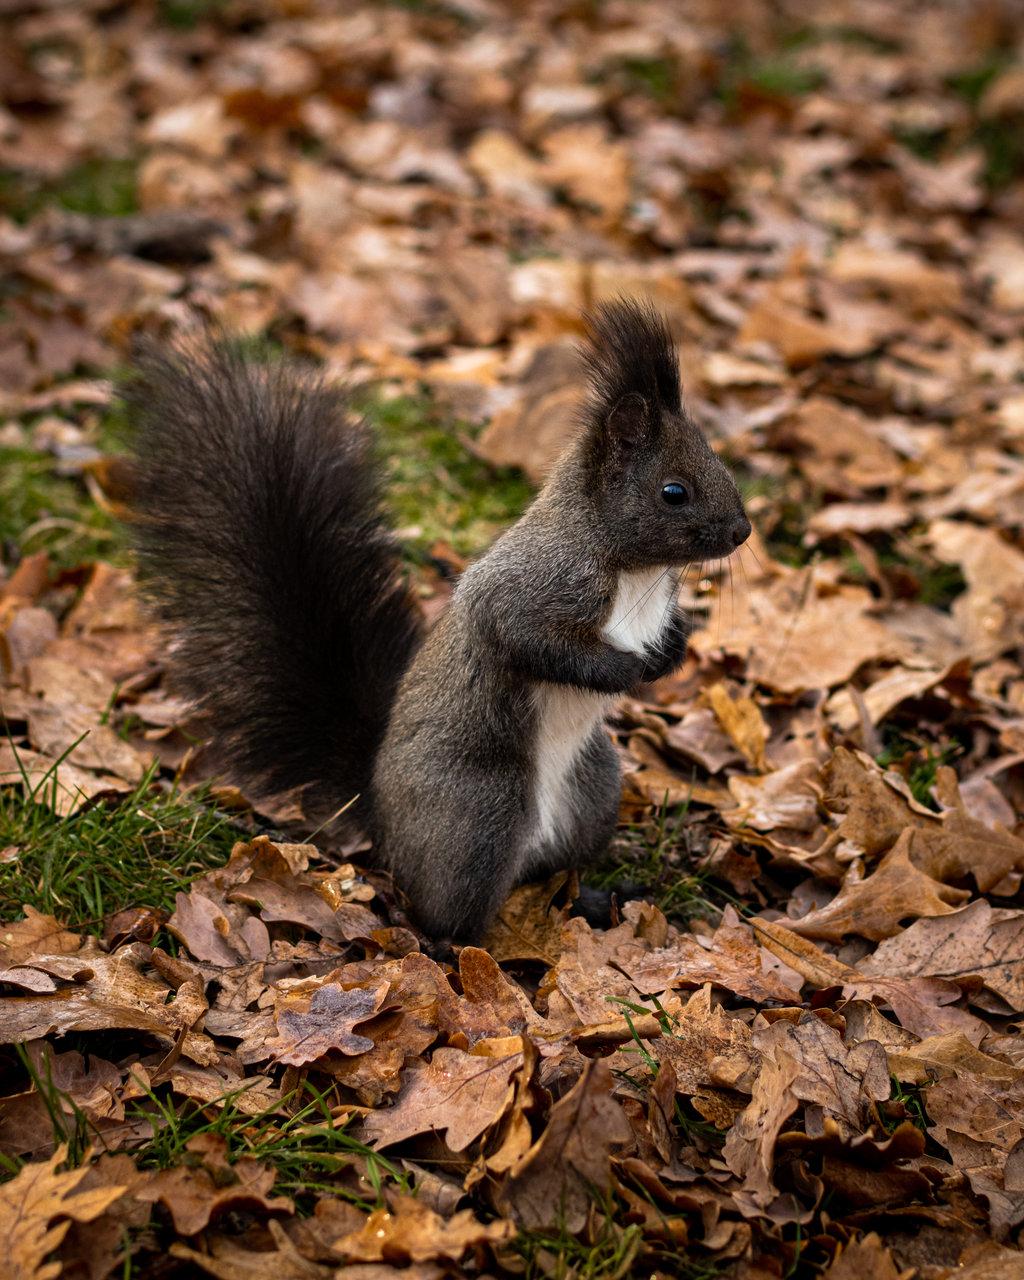 Photo in Wild life | Author Alexander Dolapchiev - redone | PHOTO FORUM